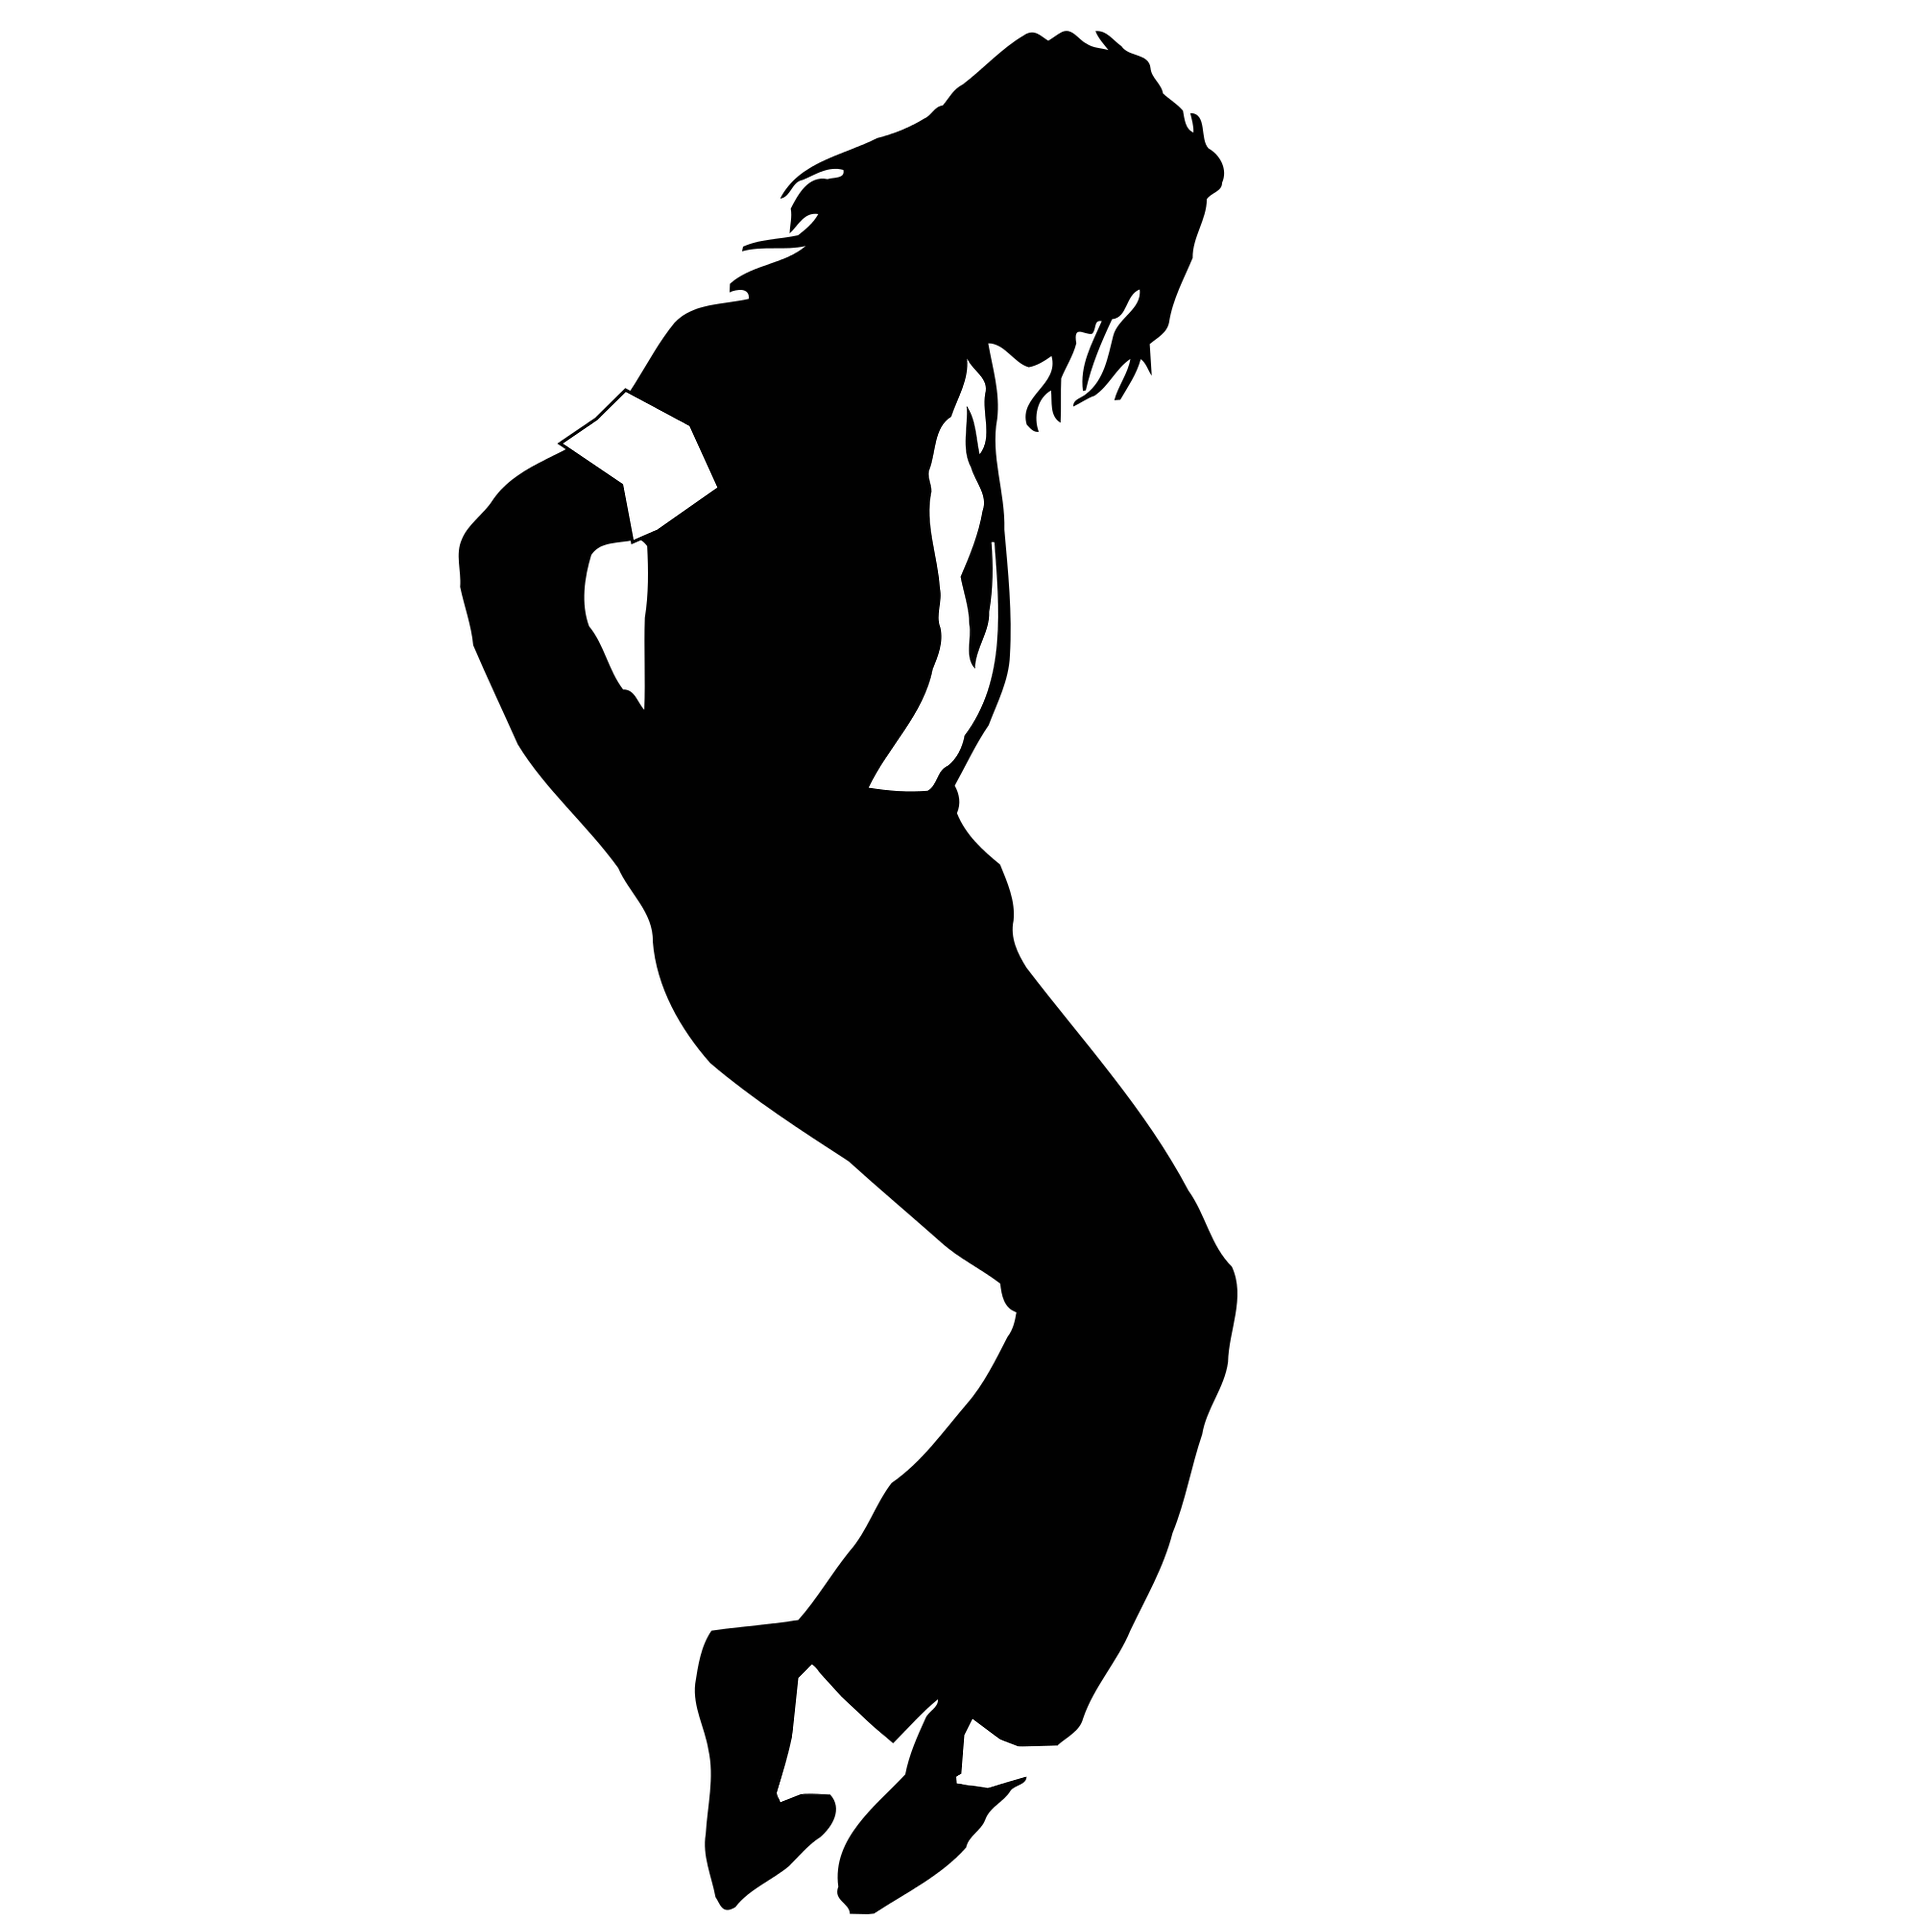 michael-jackson-black-and-white